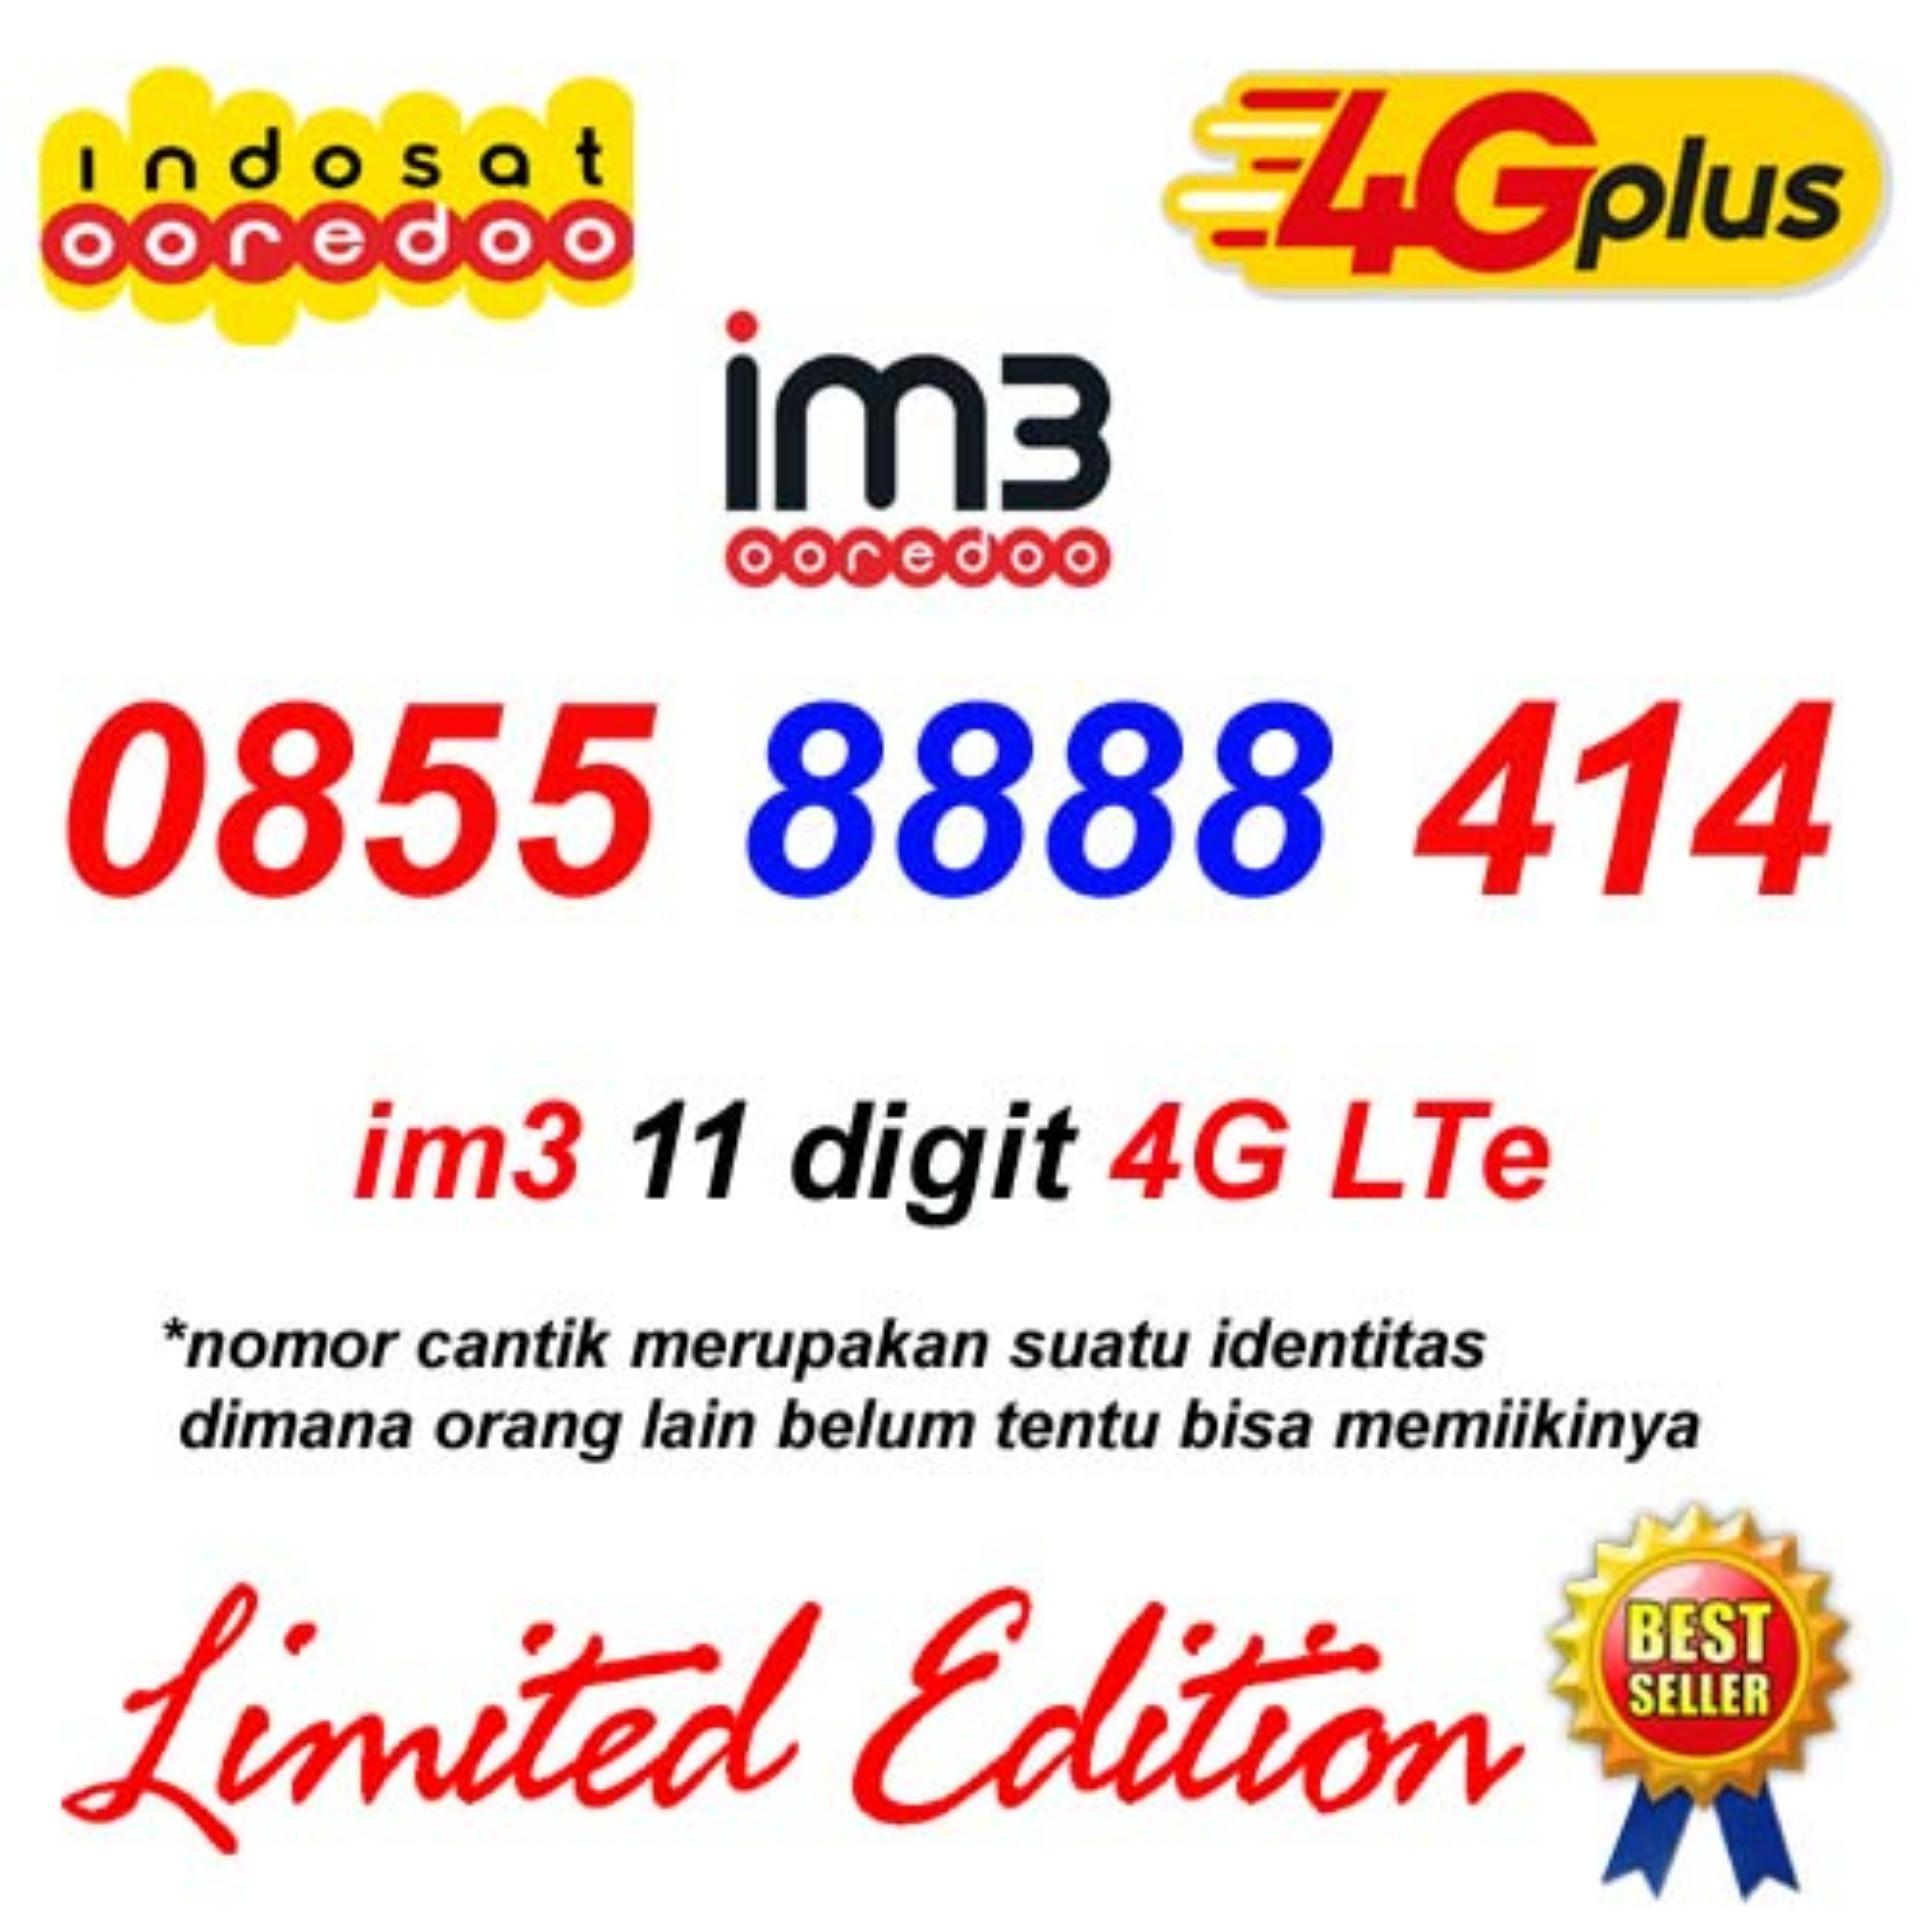 Indosat Im3 11 Digit 0855 8888 414 Kartu Perdana Nomor Cantik Ooredoo 4G Lte